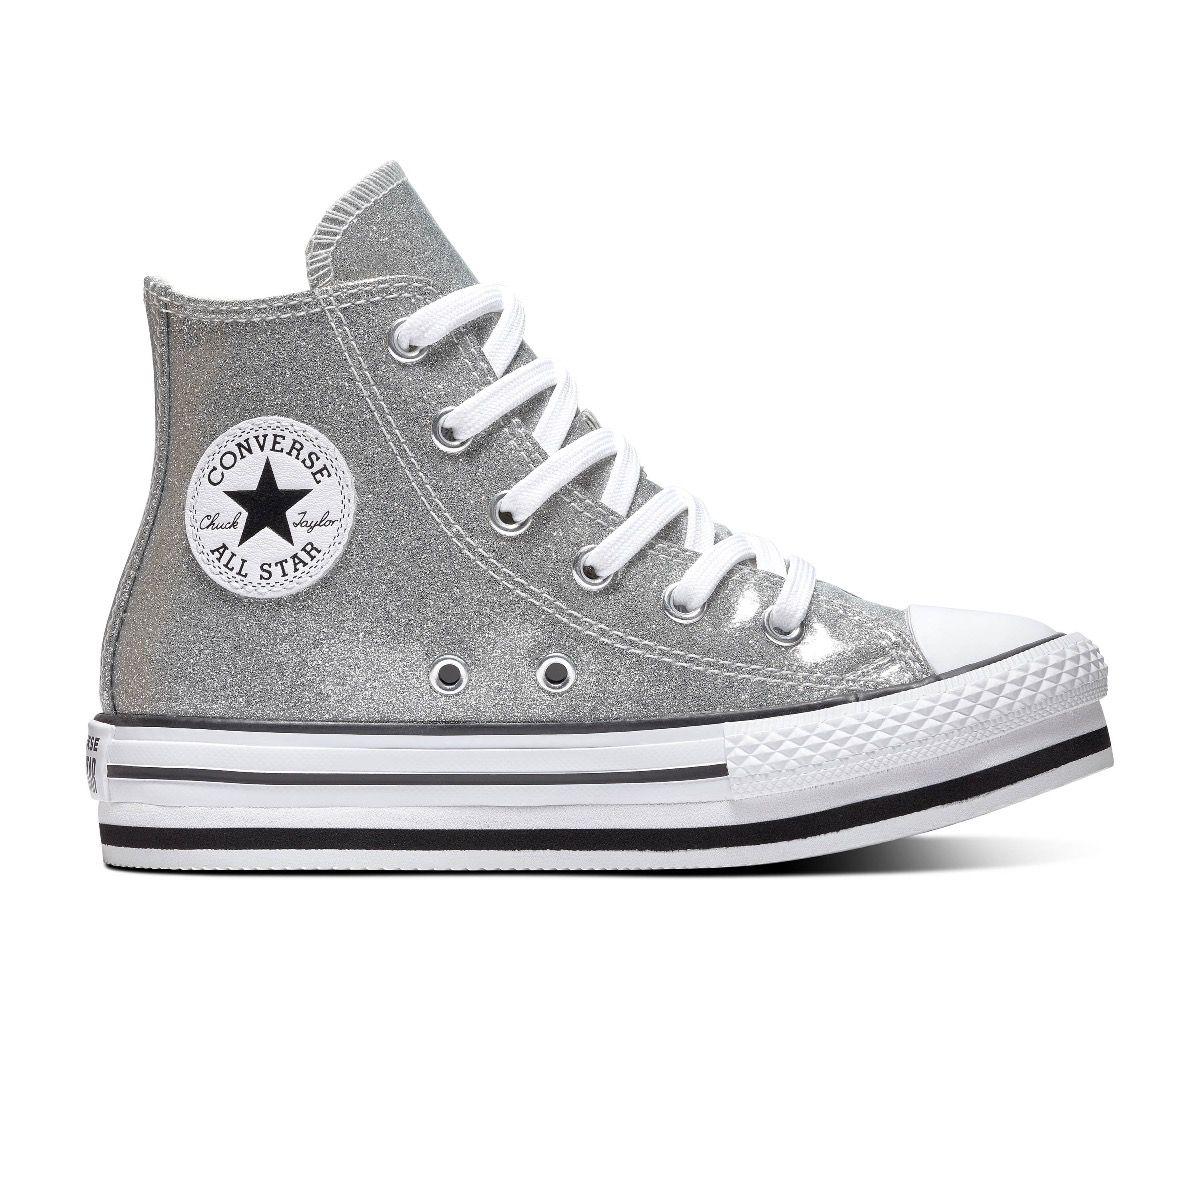 Converse All Stars Chuck Taylor Platform 666400C Zilver - Wit-37 maat 37